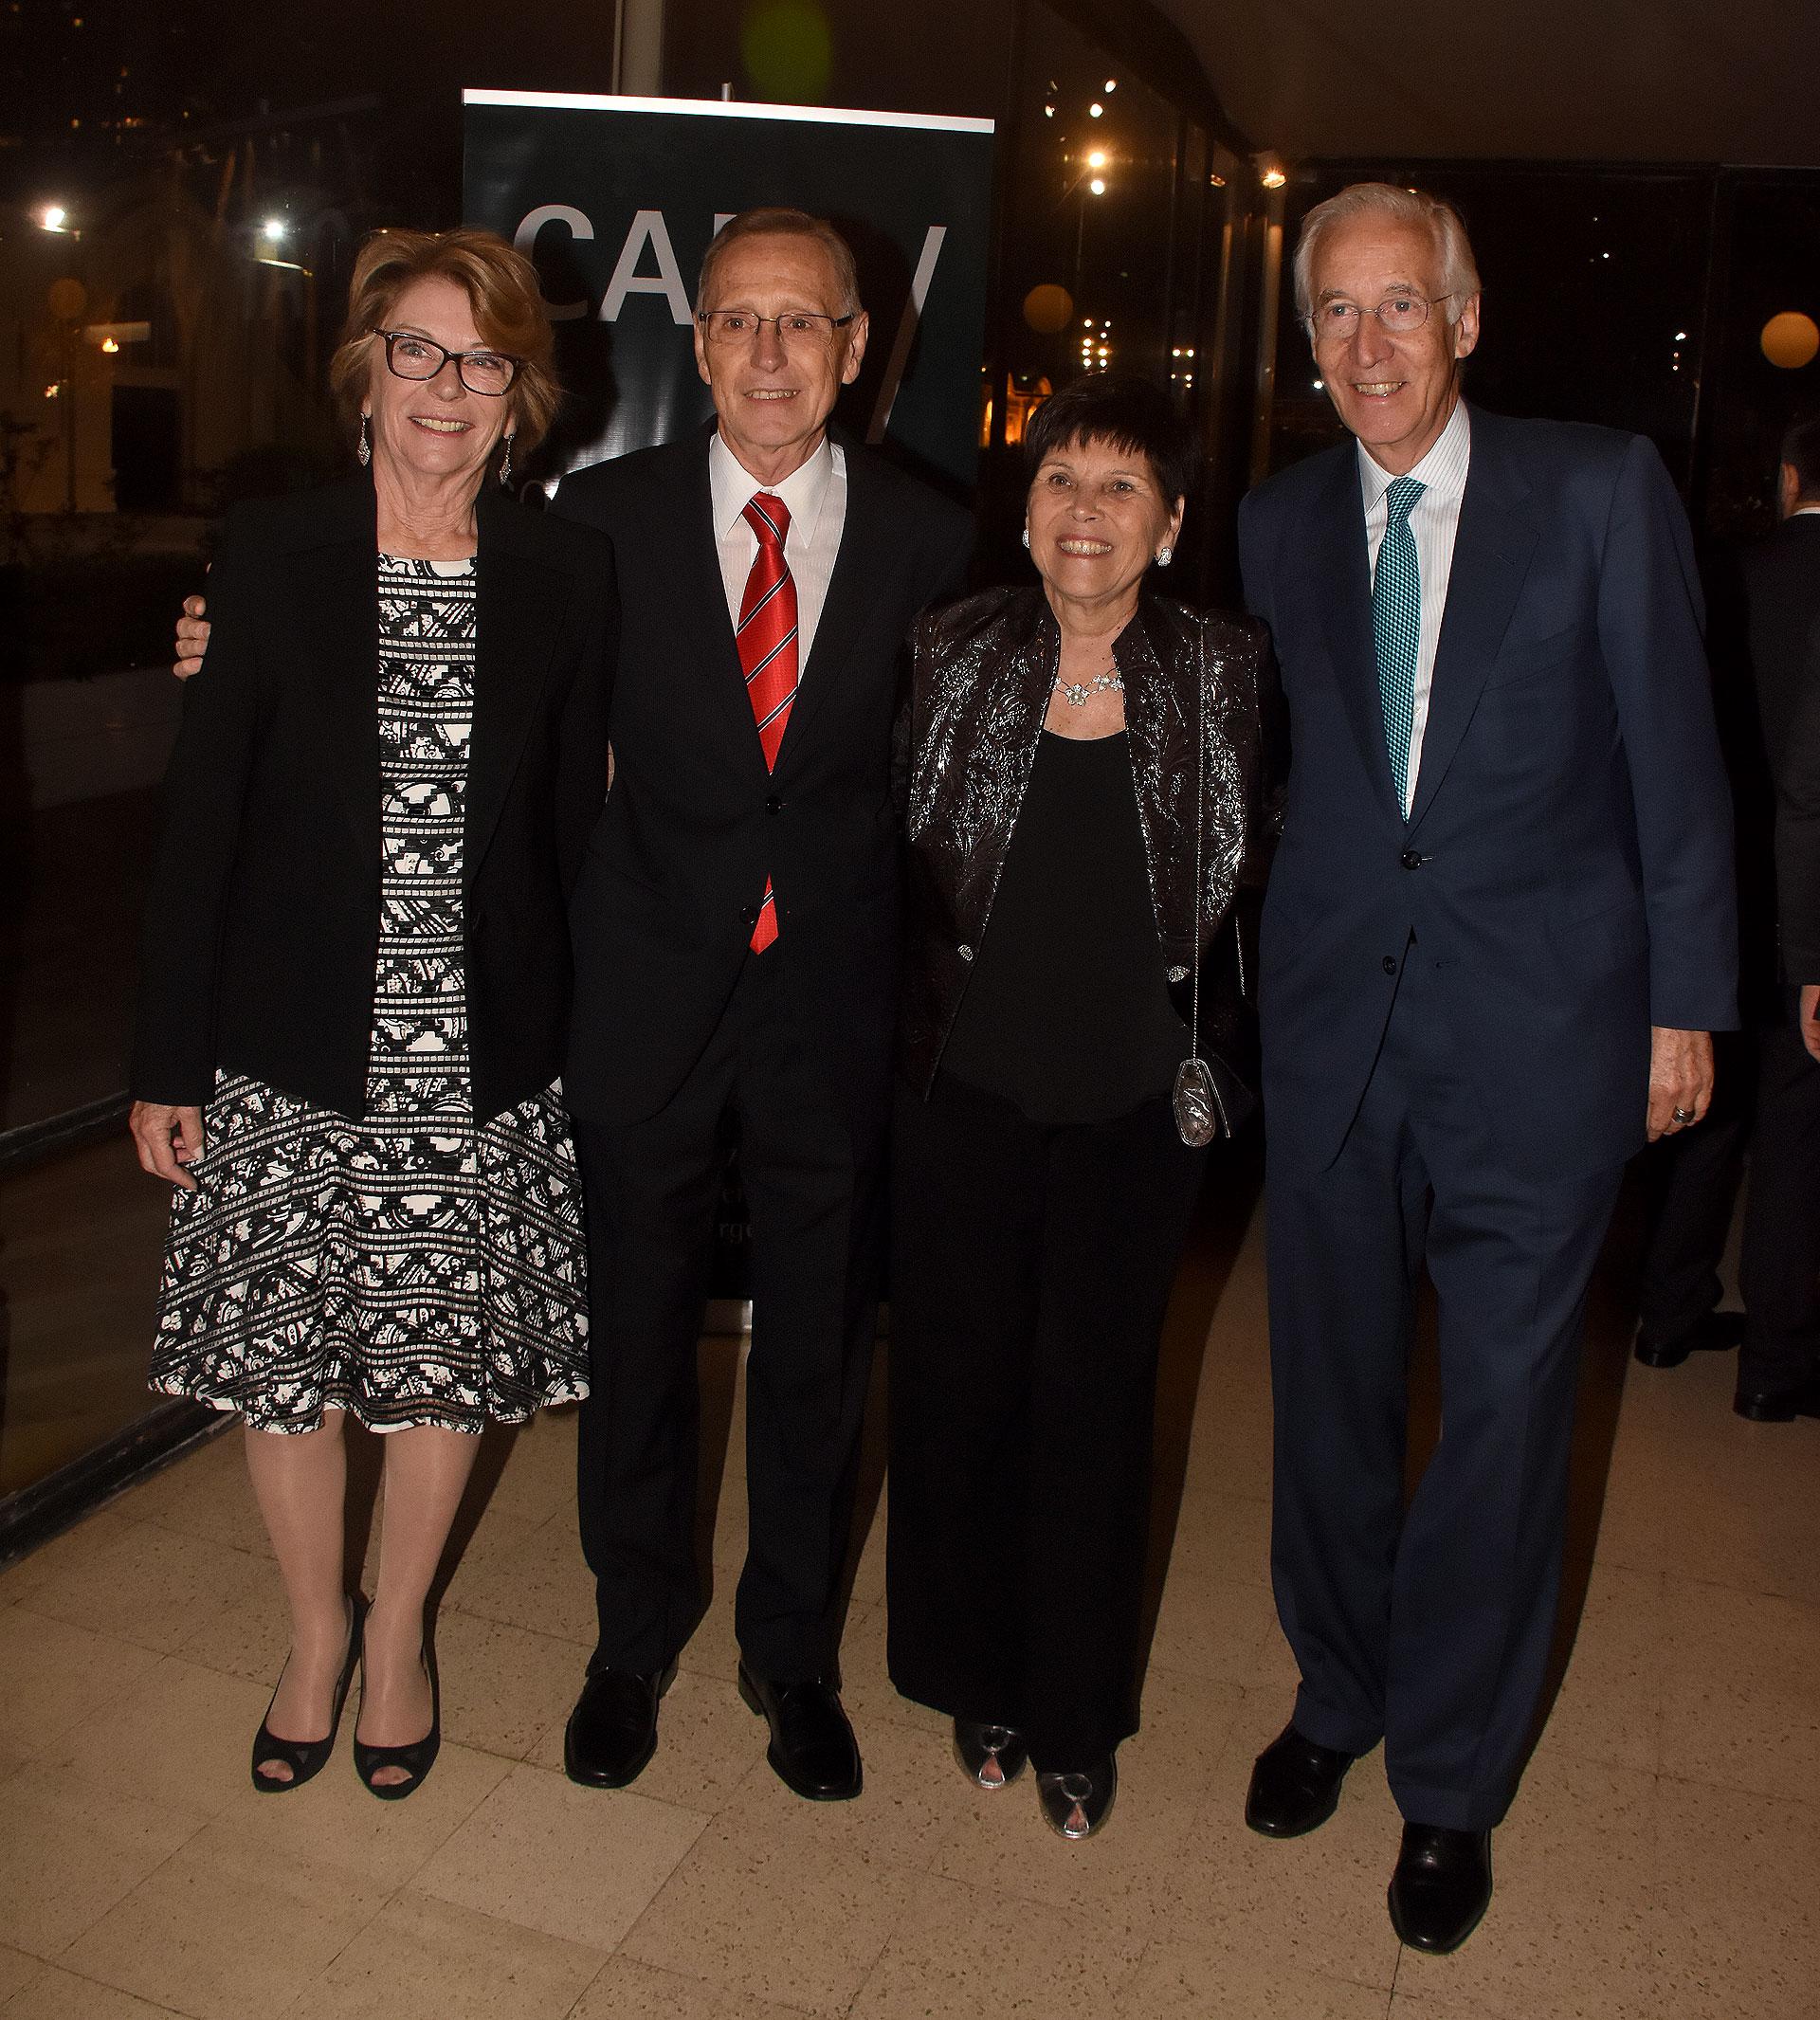 Adalberto Rodríguez Giavarini, Susana Pestana y Andrés von Buch /// Fotos: Nicolás Stulberg